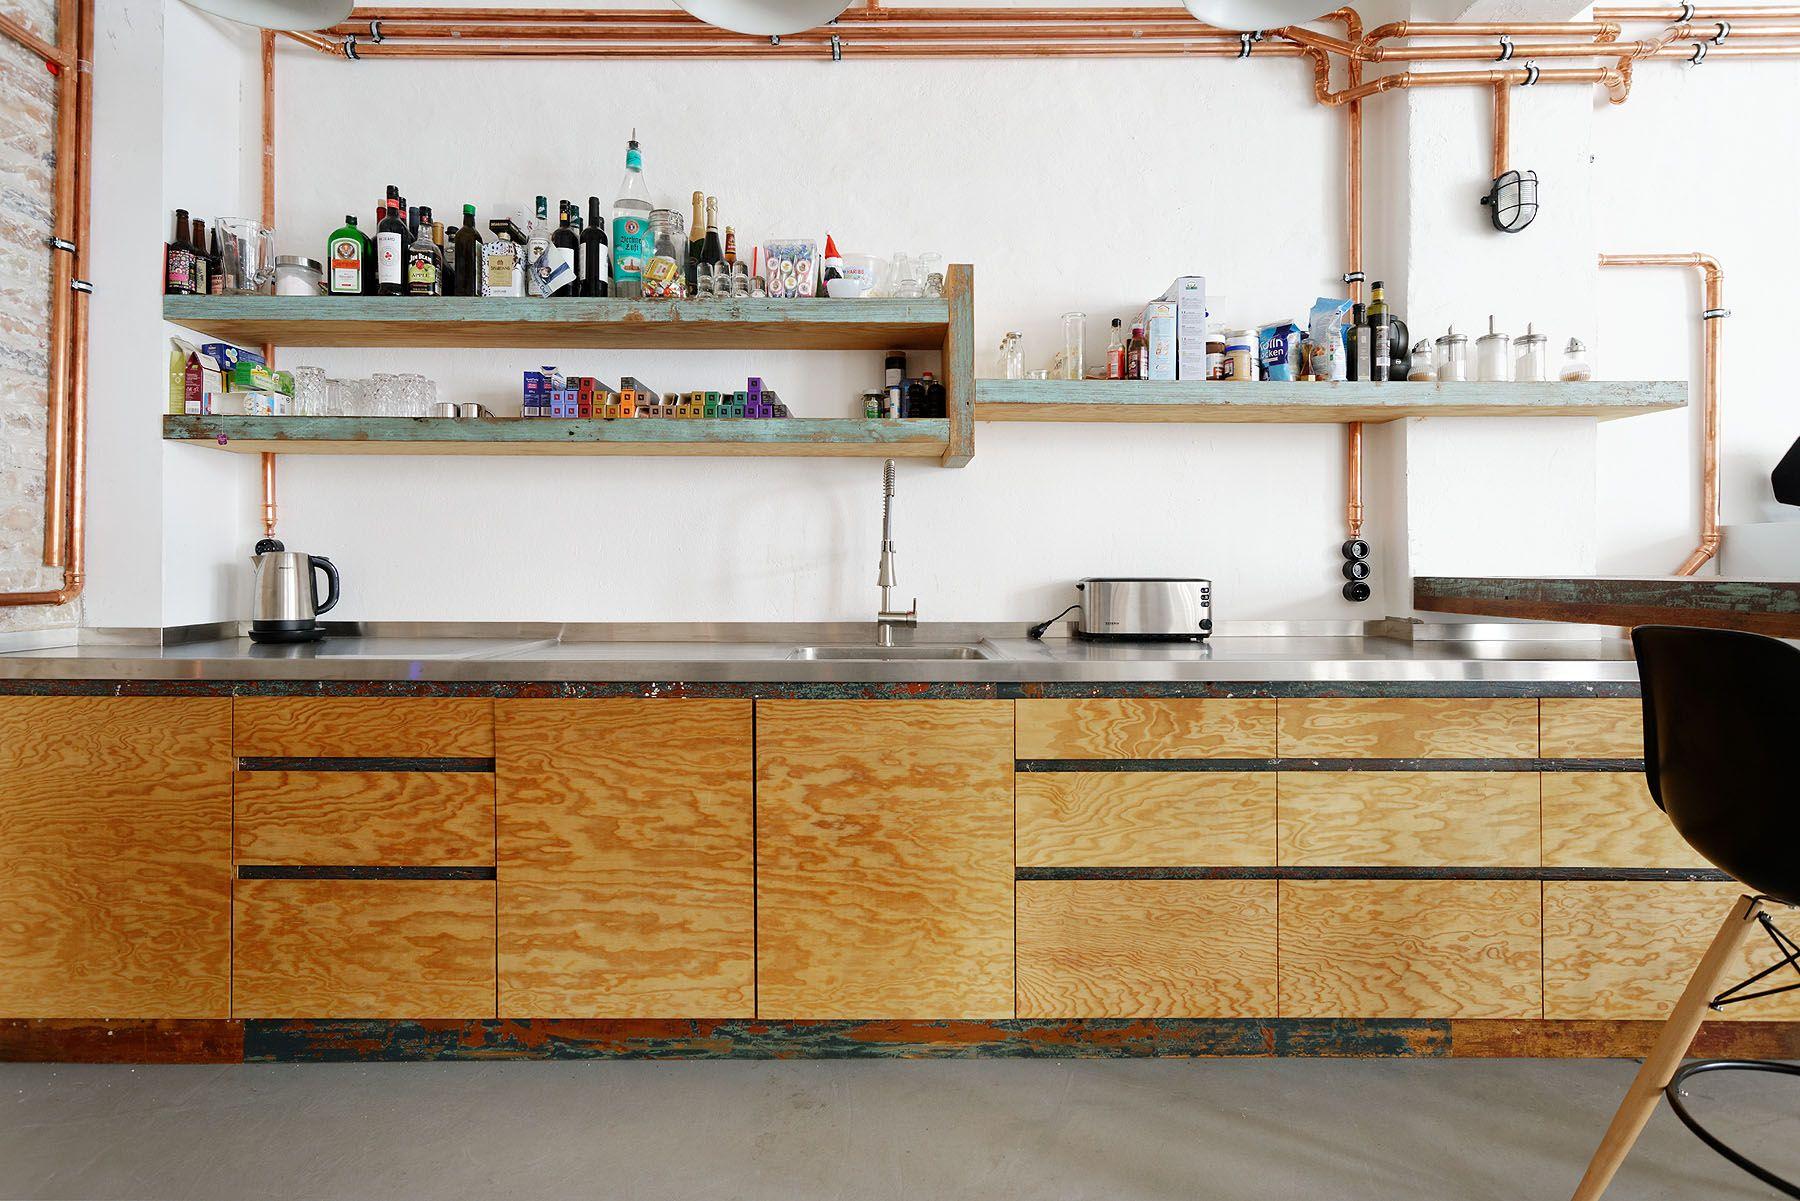 irold m bel its us media k che seekiefer alte berliner diele innenausbau pinterest diele. Black Bedroom Furniture Sets. Home Design Ideas